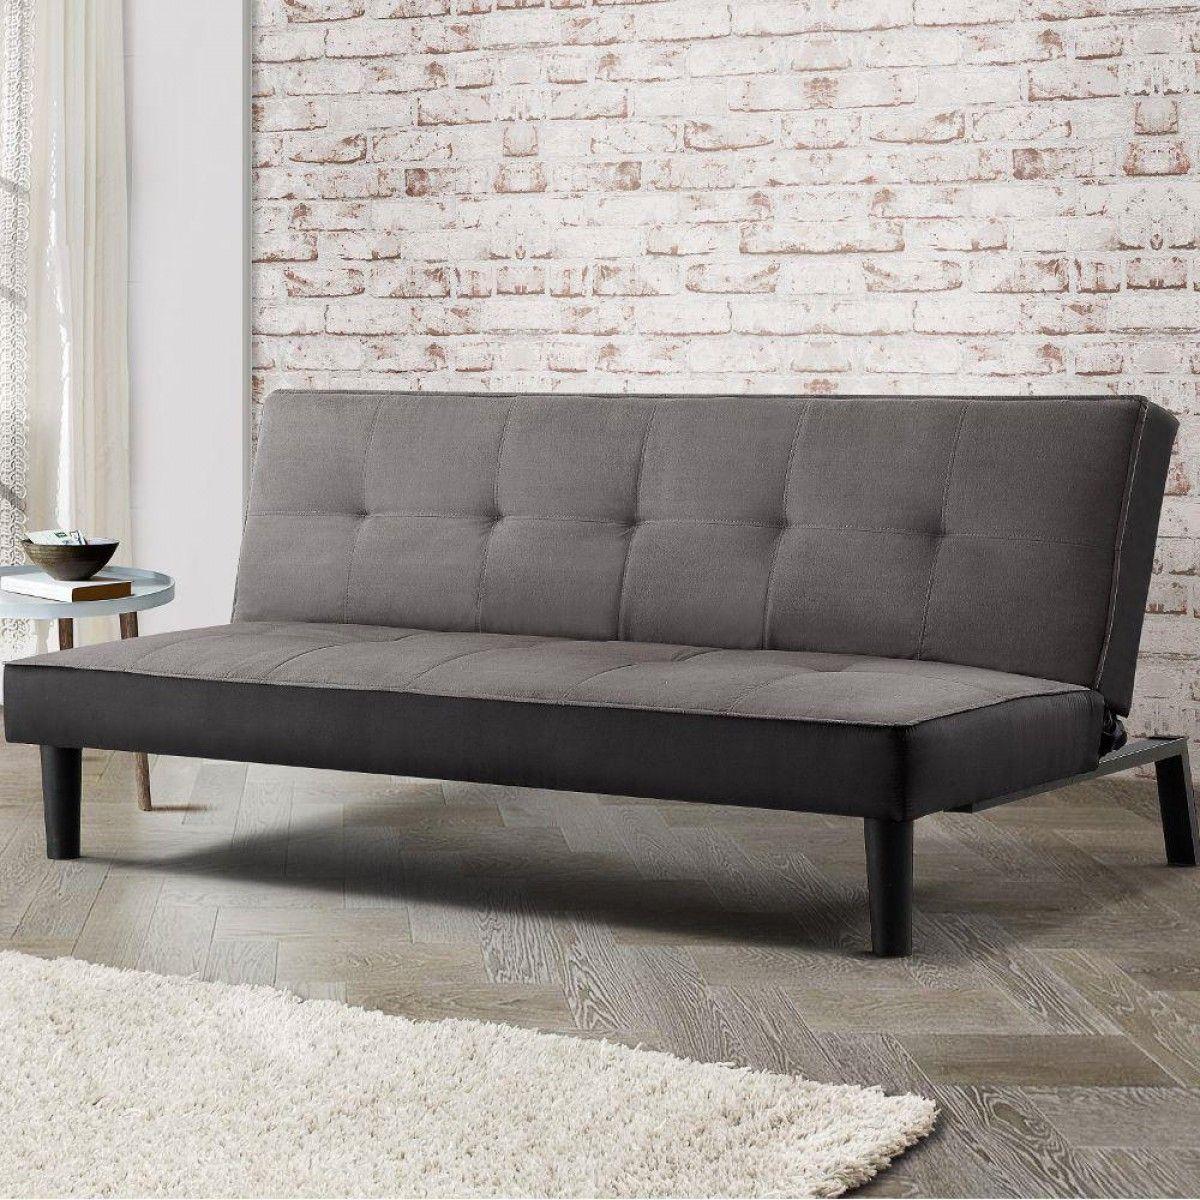 Aurora Grey Fabric Sofa Bed Minimalist Sofa Velvet Sofa Bed Sofa Bed